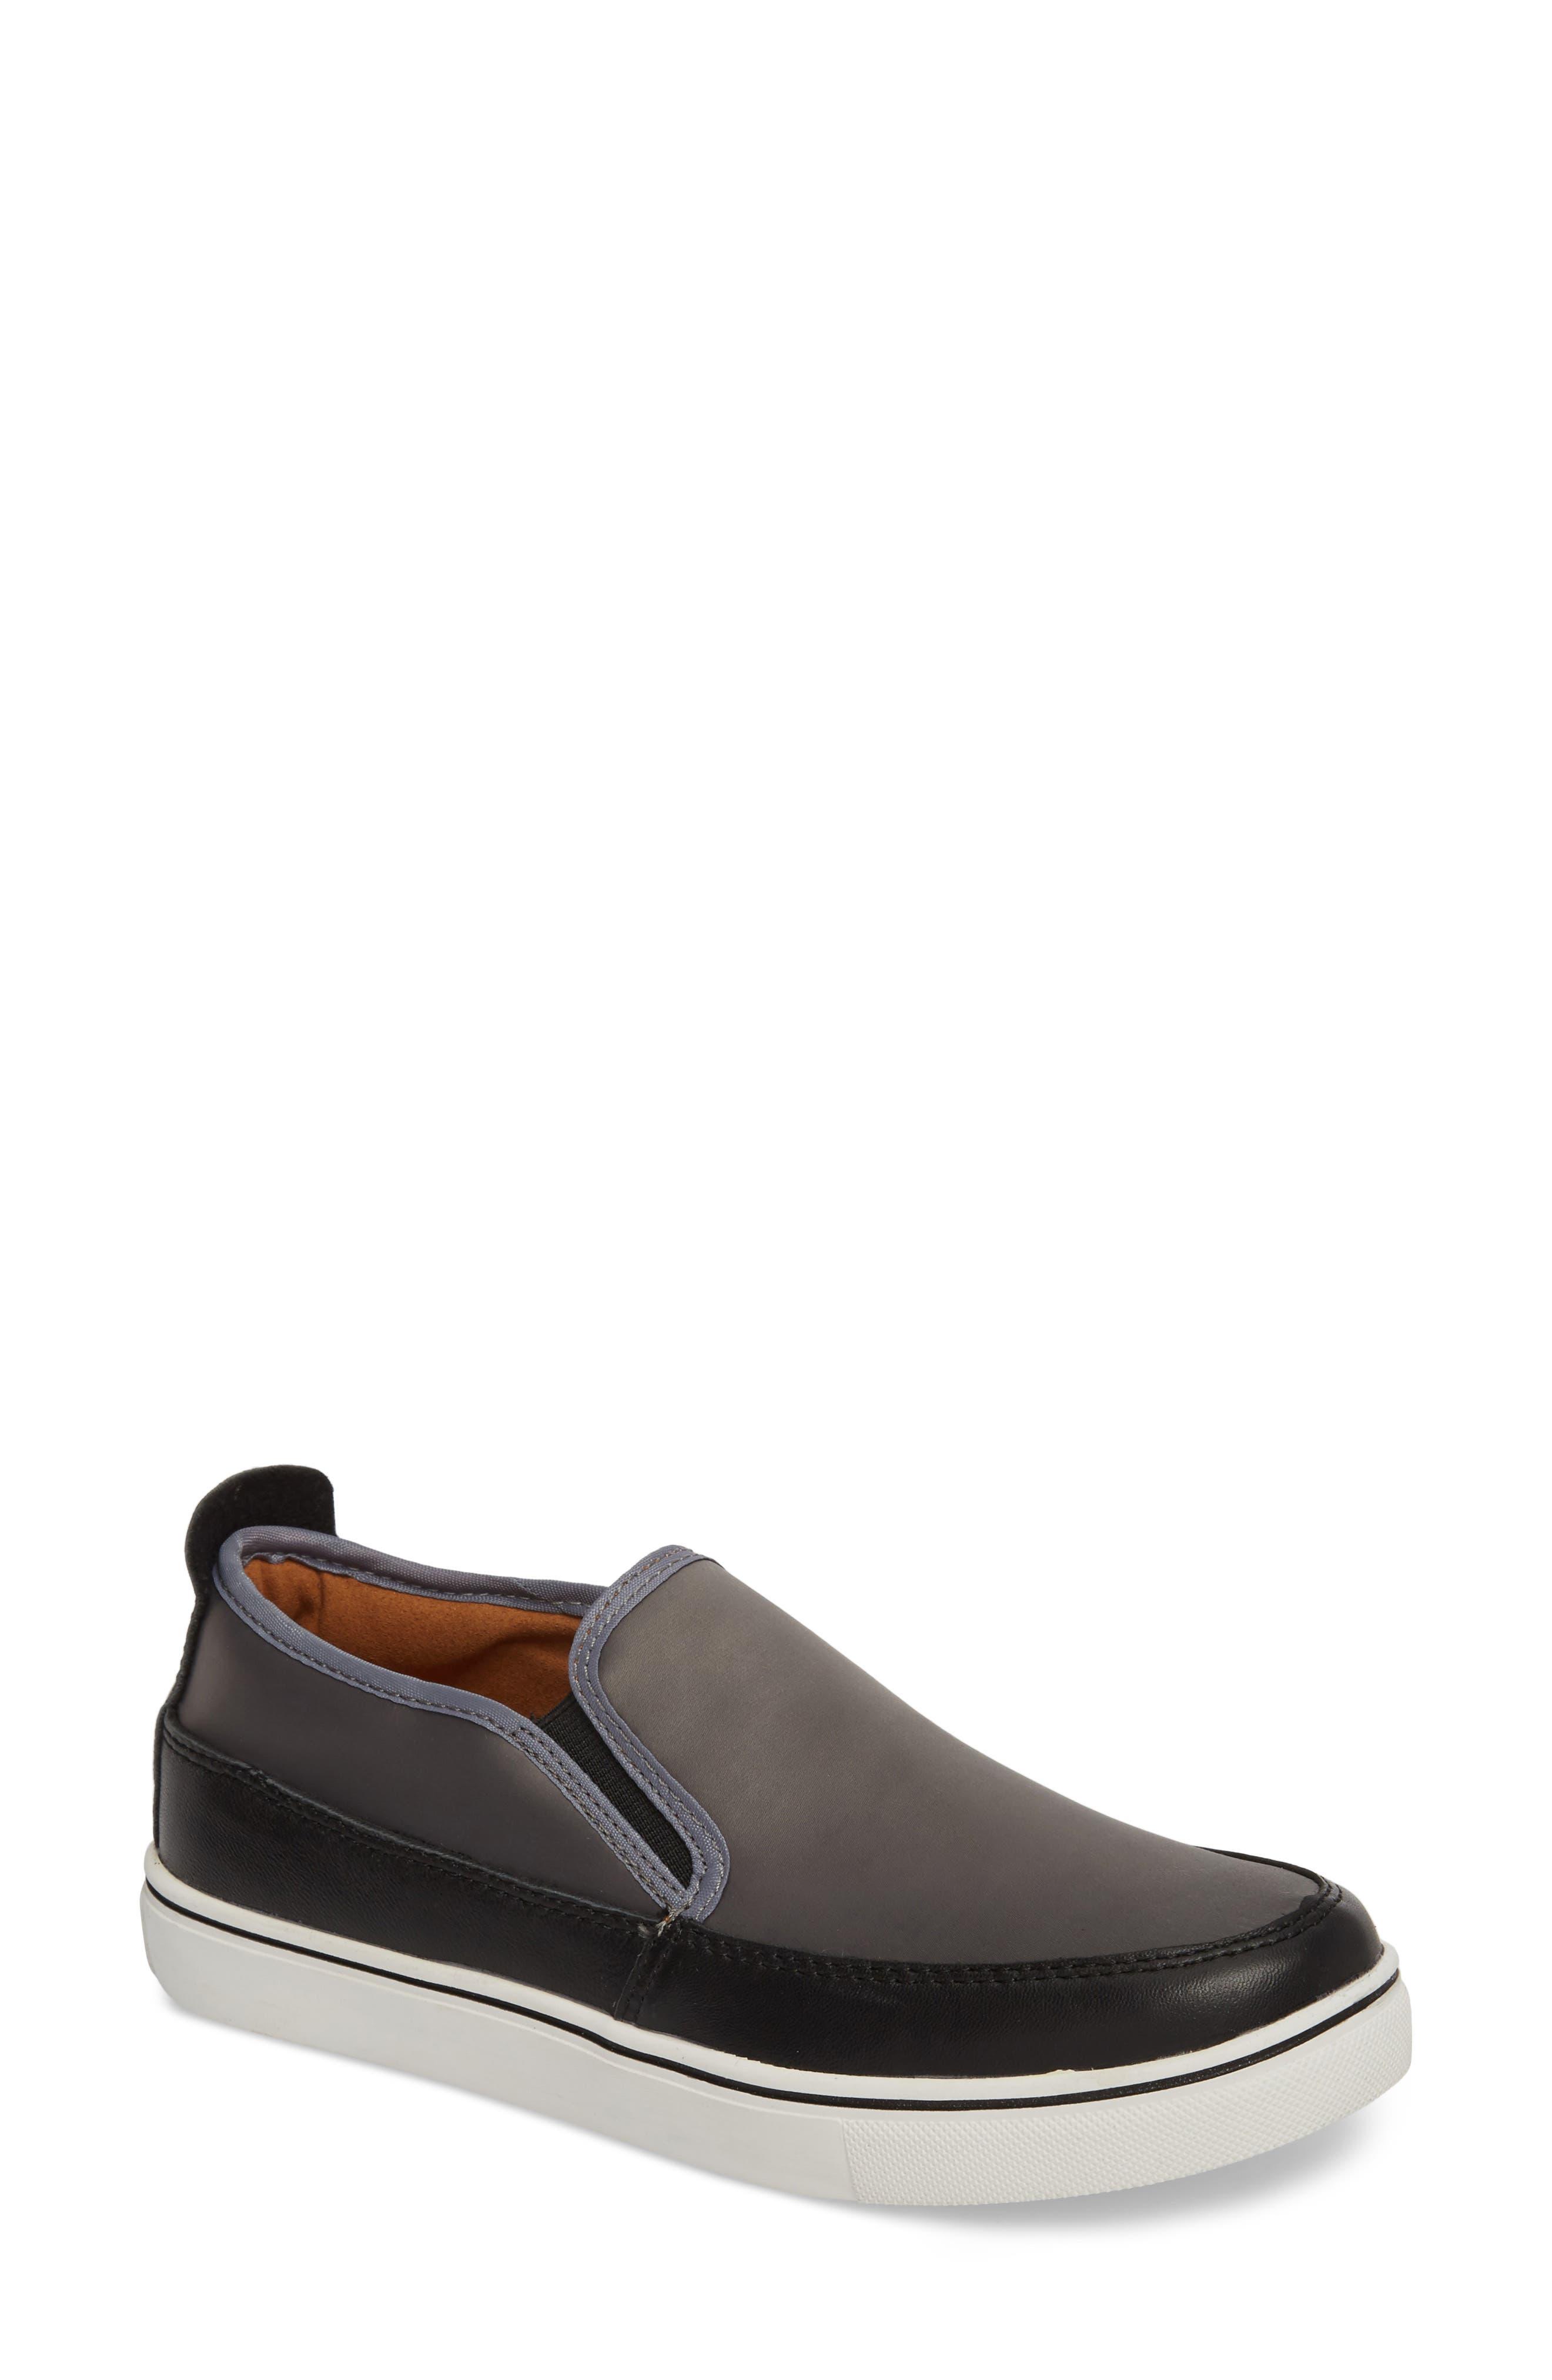 Double Gore Sneaker,                             Main thumbnail 1, color,                             GREY SATIN